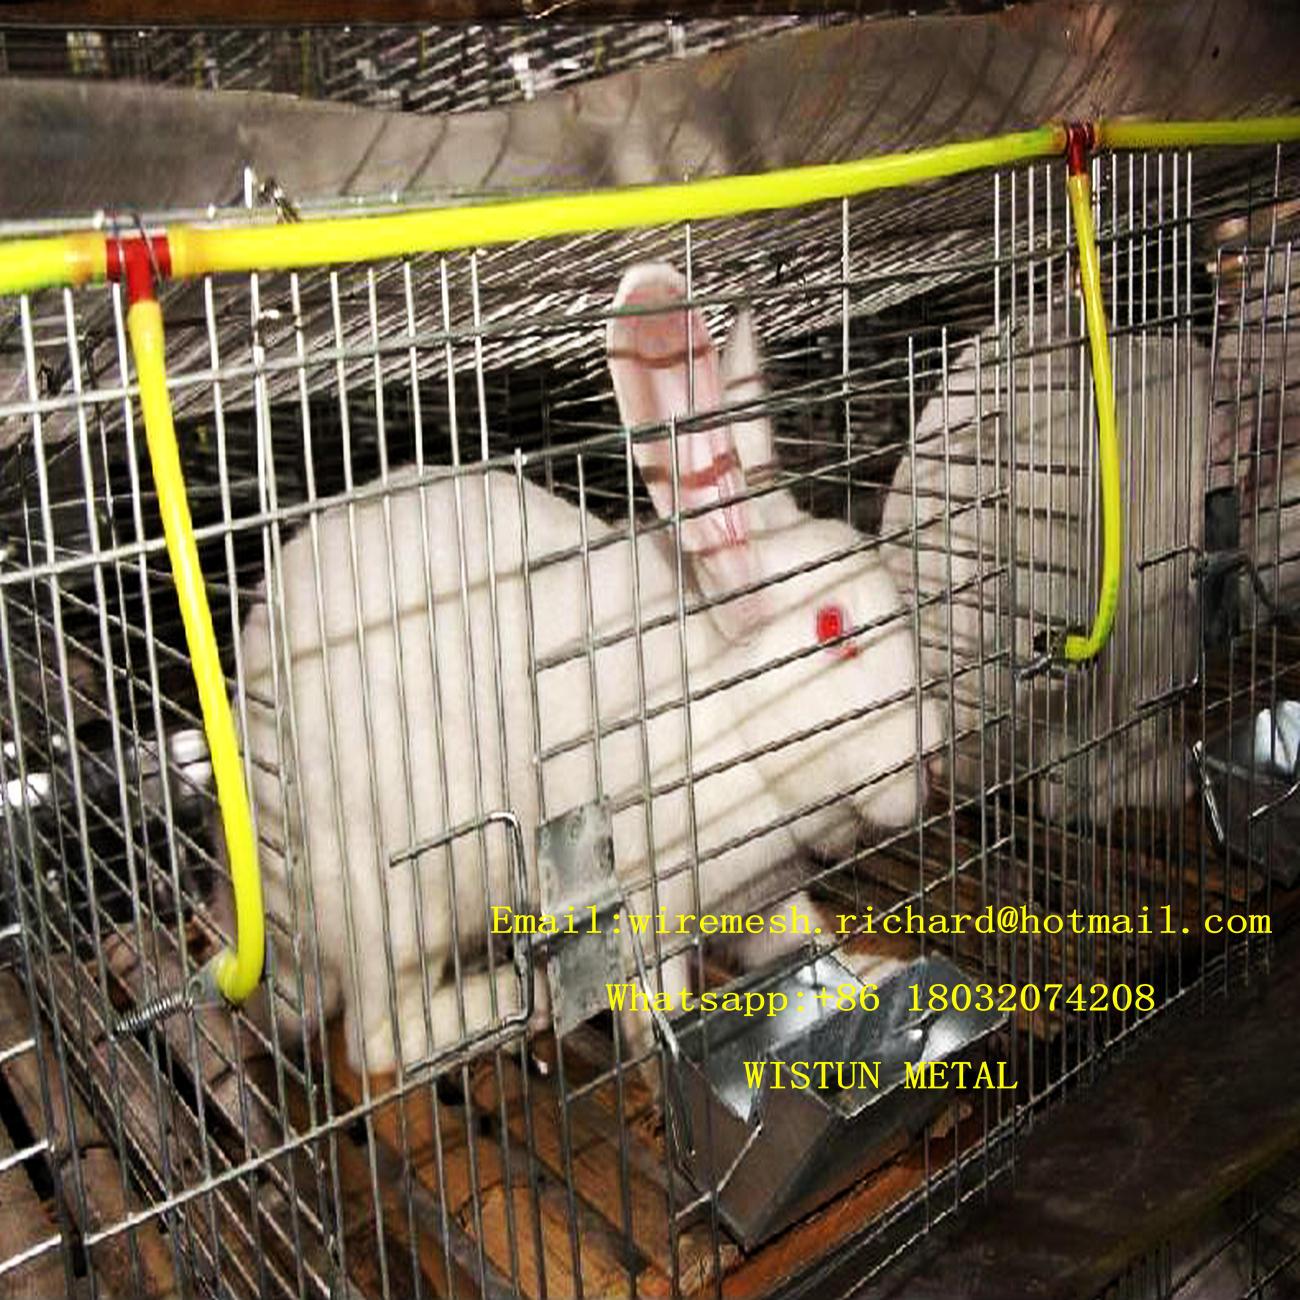 Großartig Kaninchen Käfig Drahtgeflecht Bilder - Schaltplan Serie ...